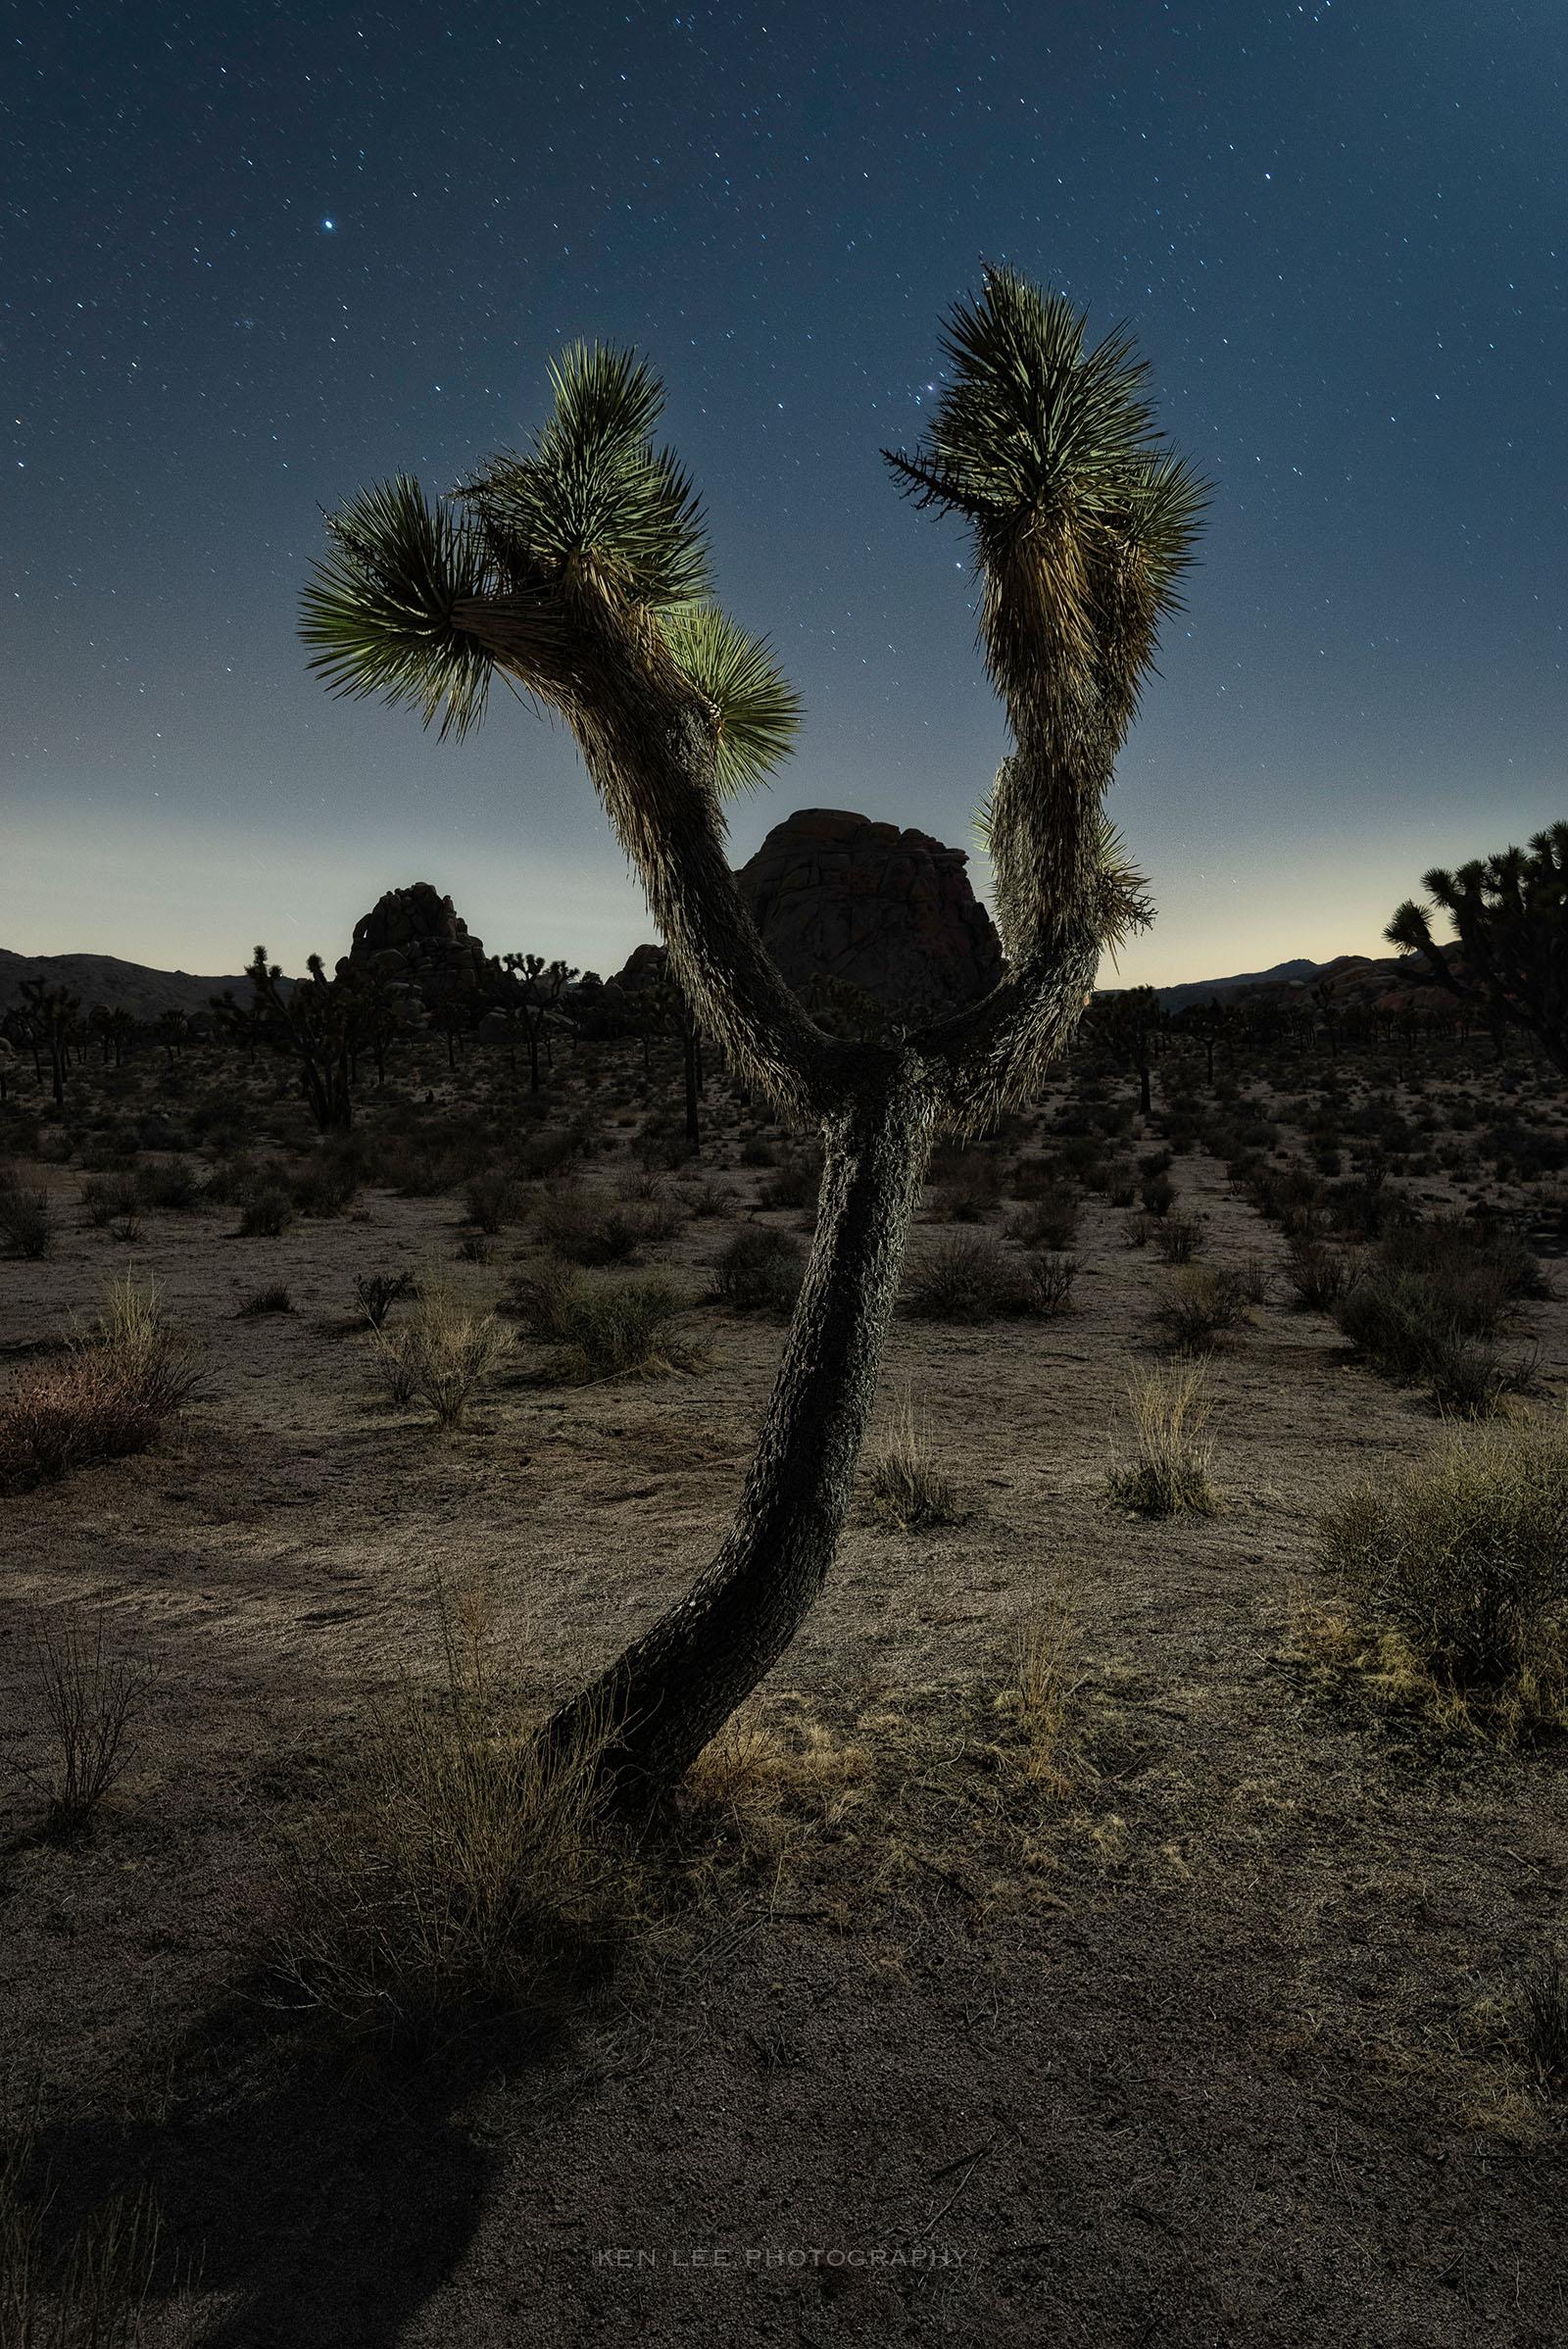 4013_kenlee_joshuatree_210320_2220_30sf71iso1600_wishbone-joshua-tree-sidelit-1600px-metadata photofocus